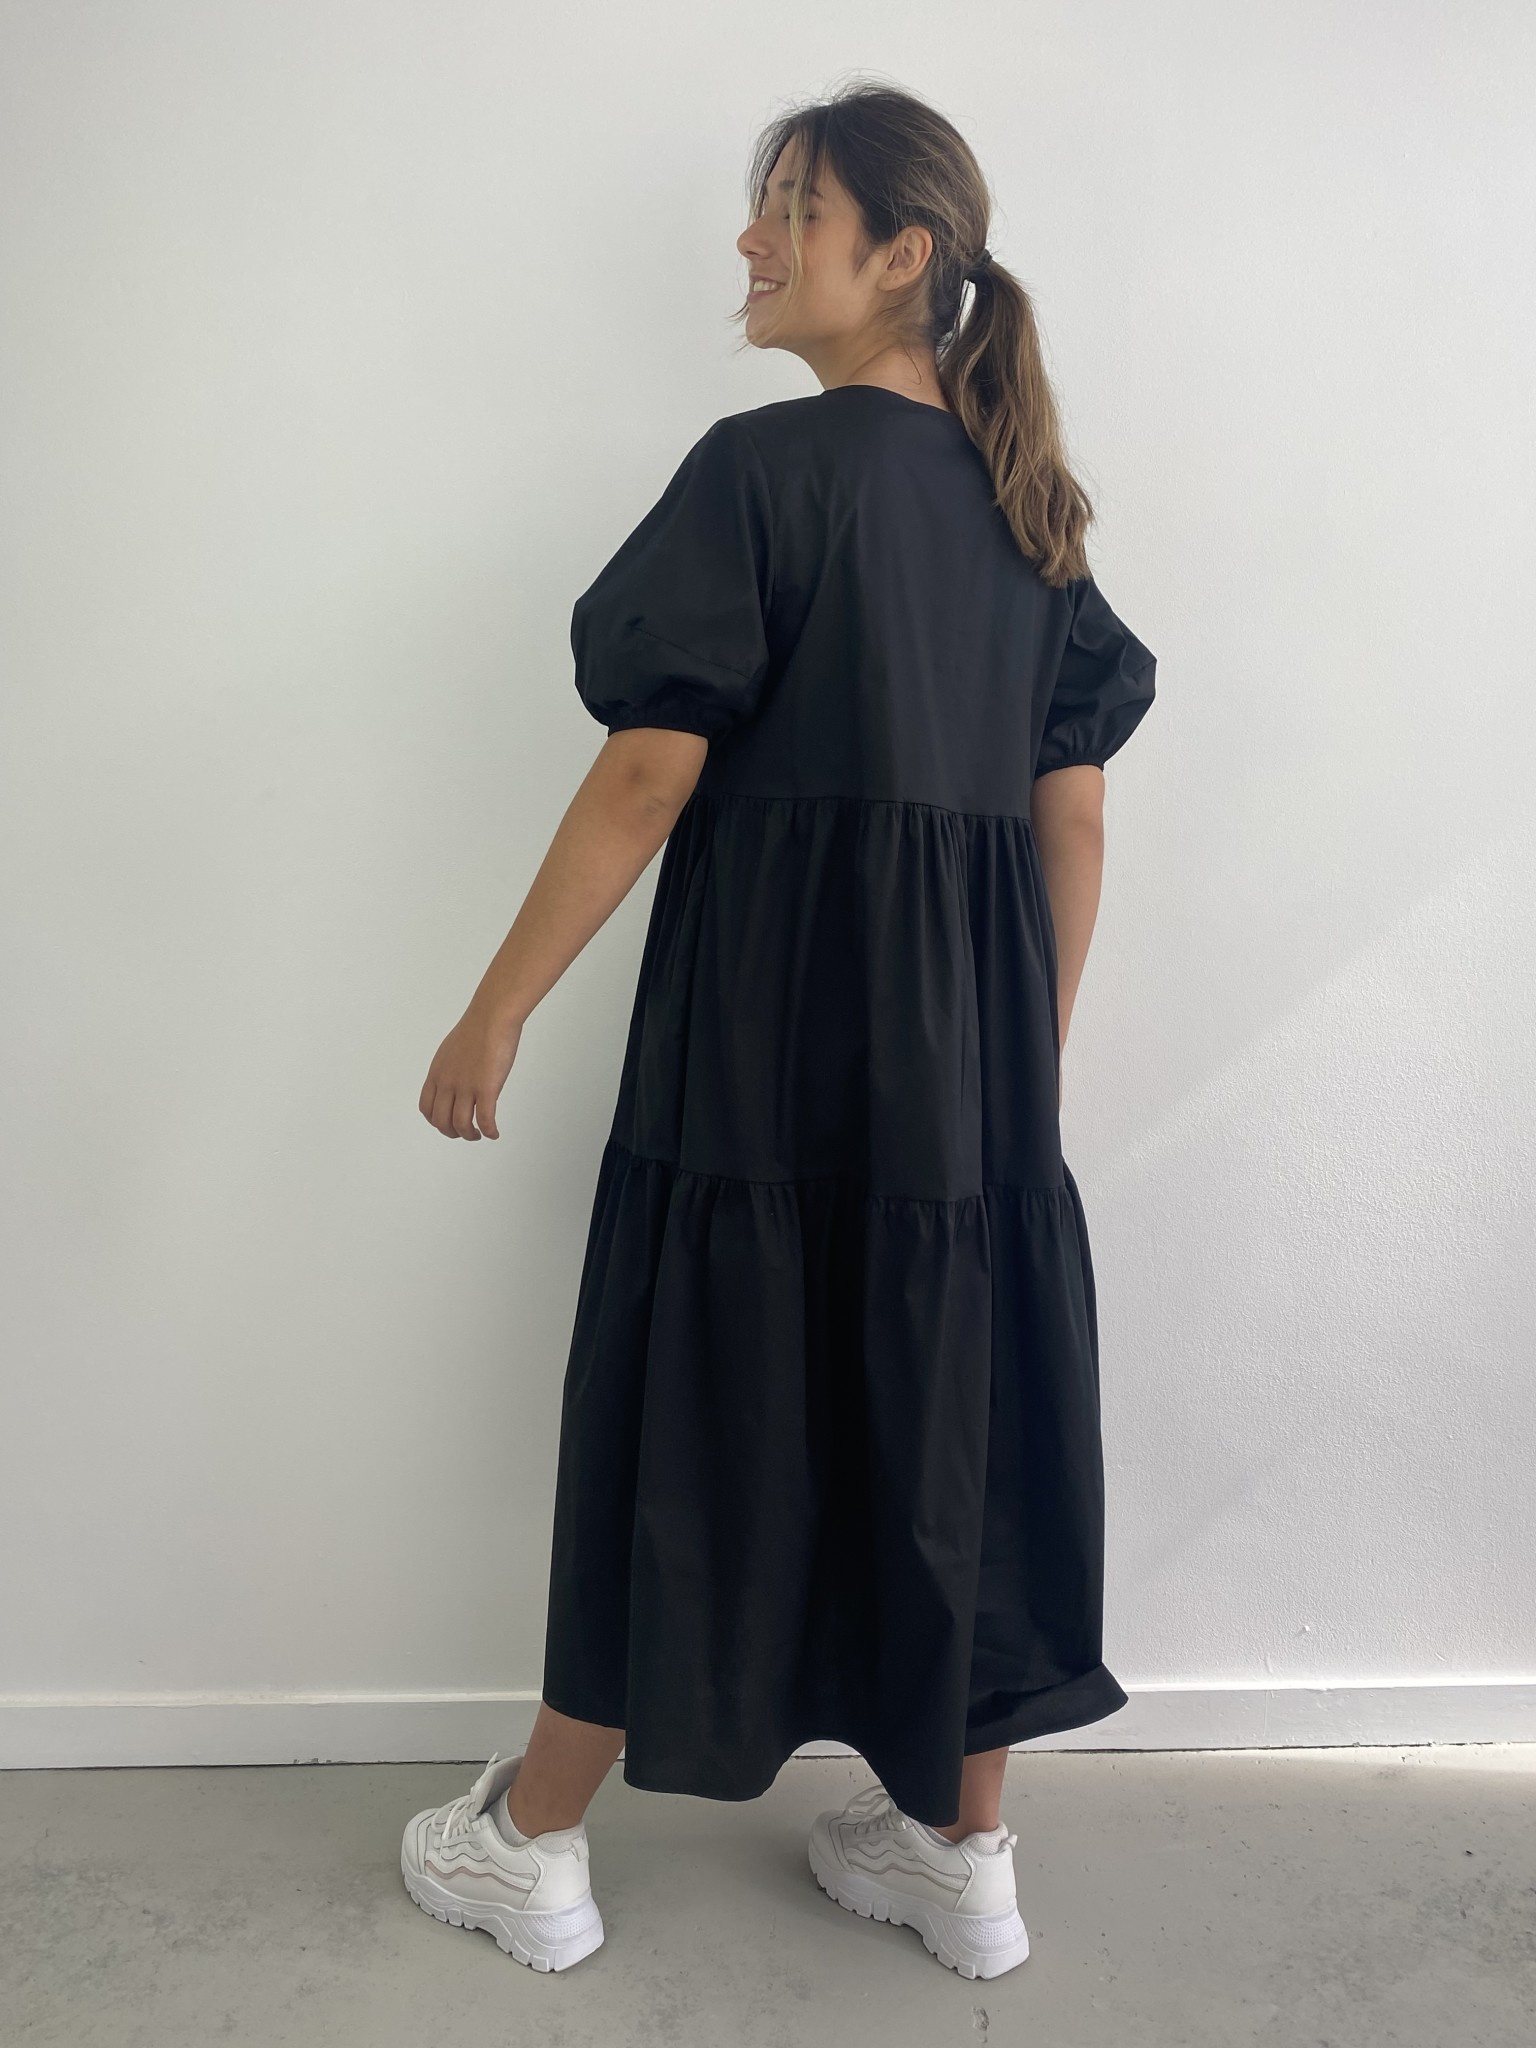 Jovie urban dress Black-2